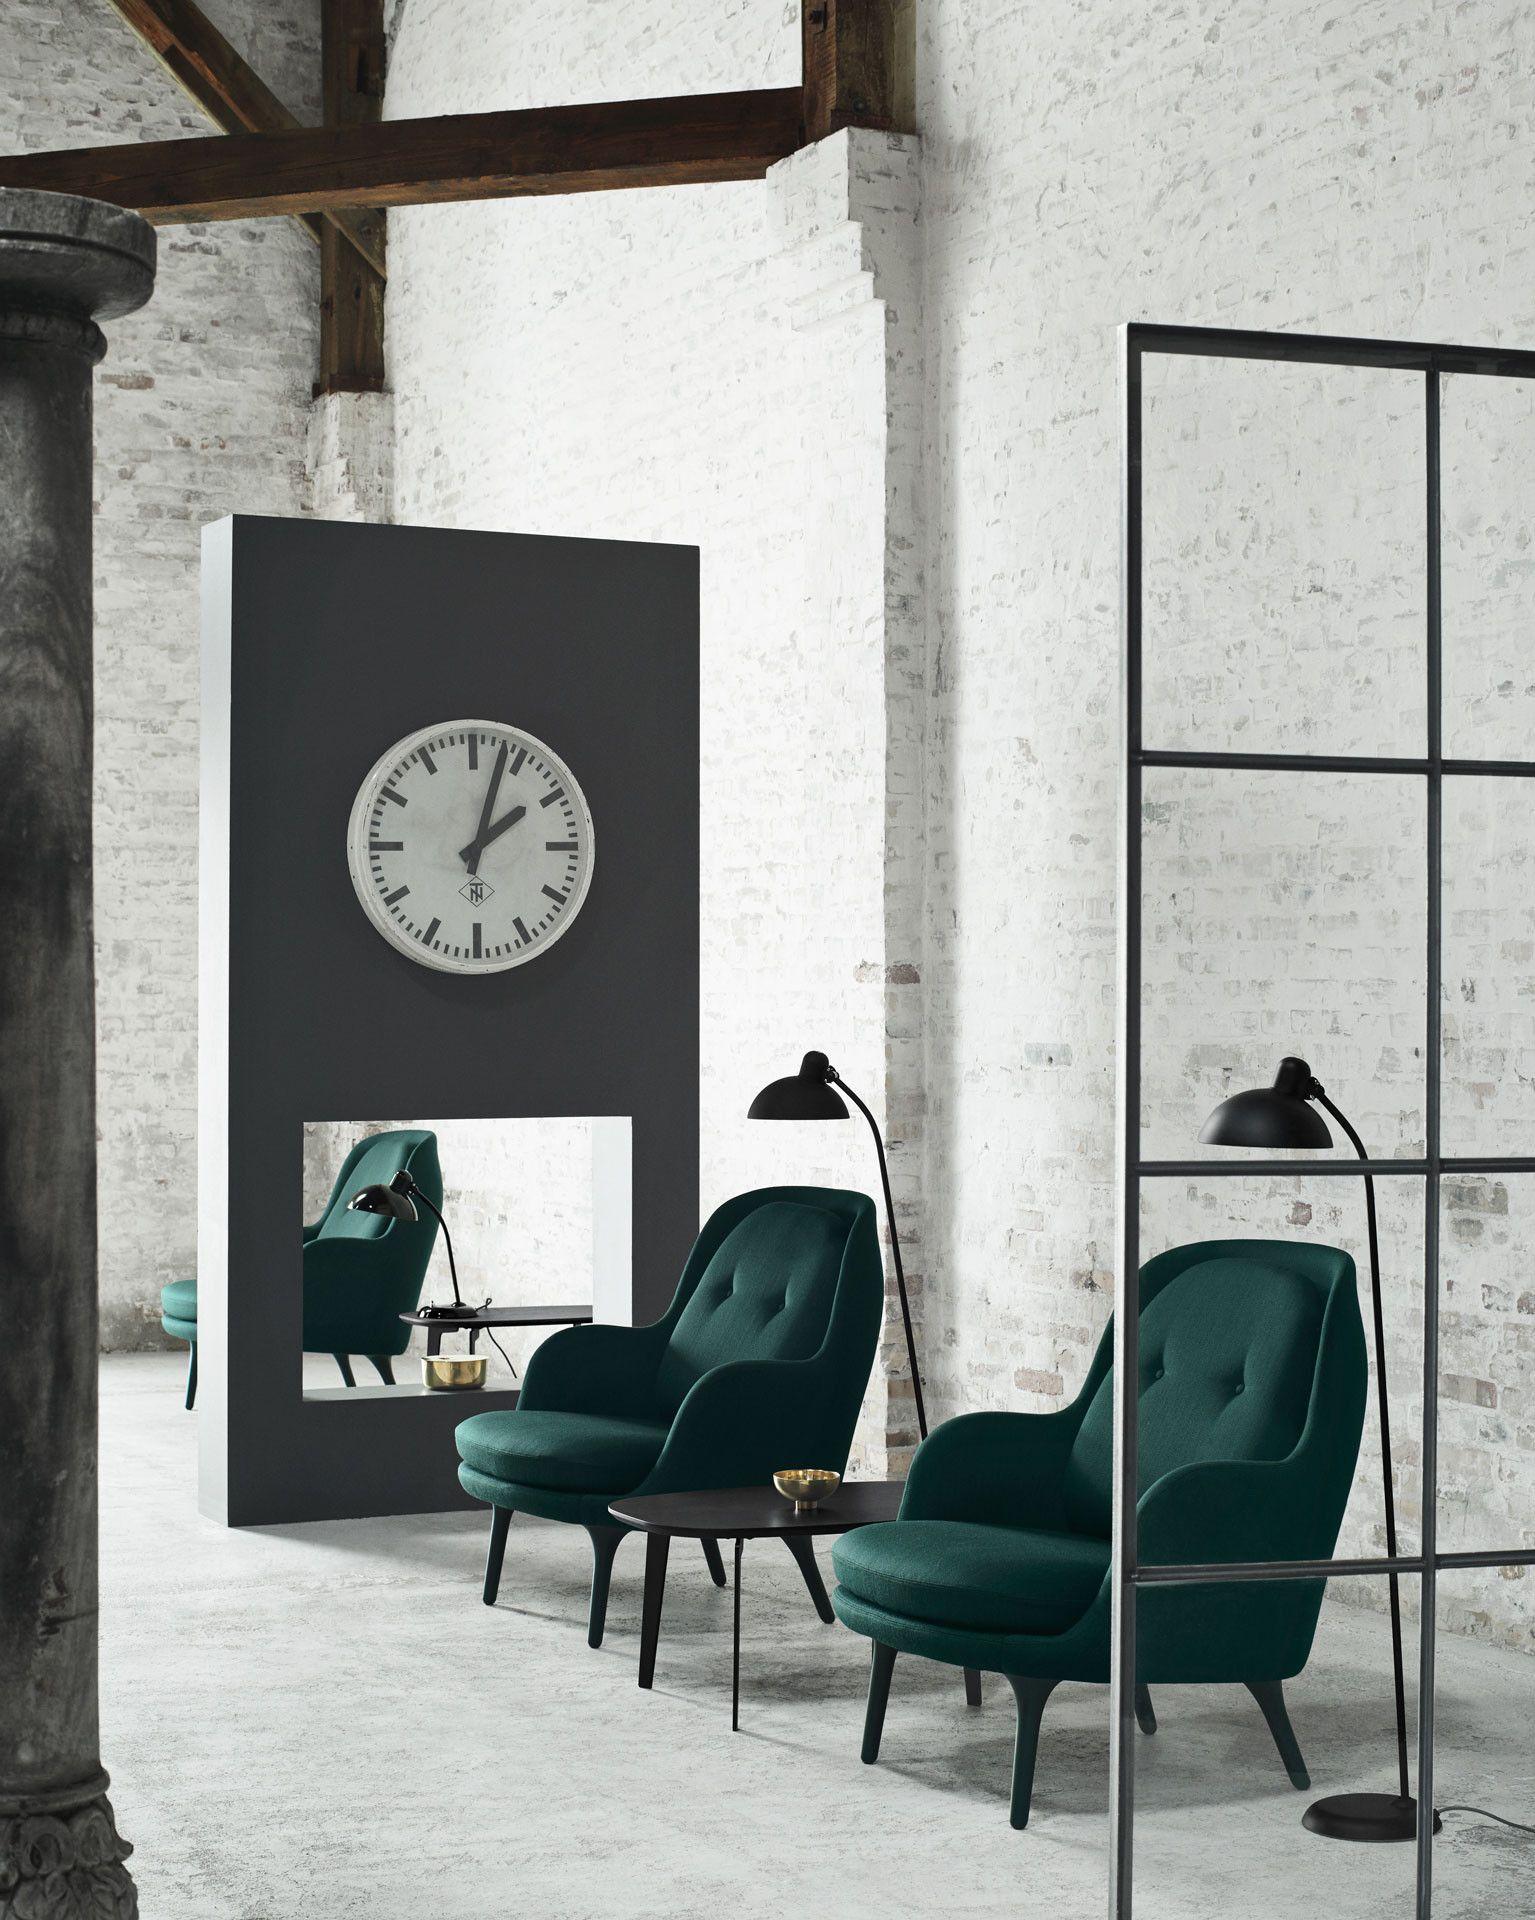 fritz hansen jaime hayon fri chair dark green fabric 1535—1920